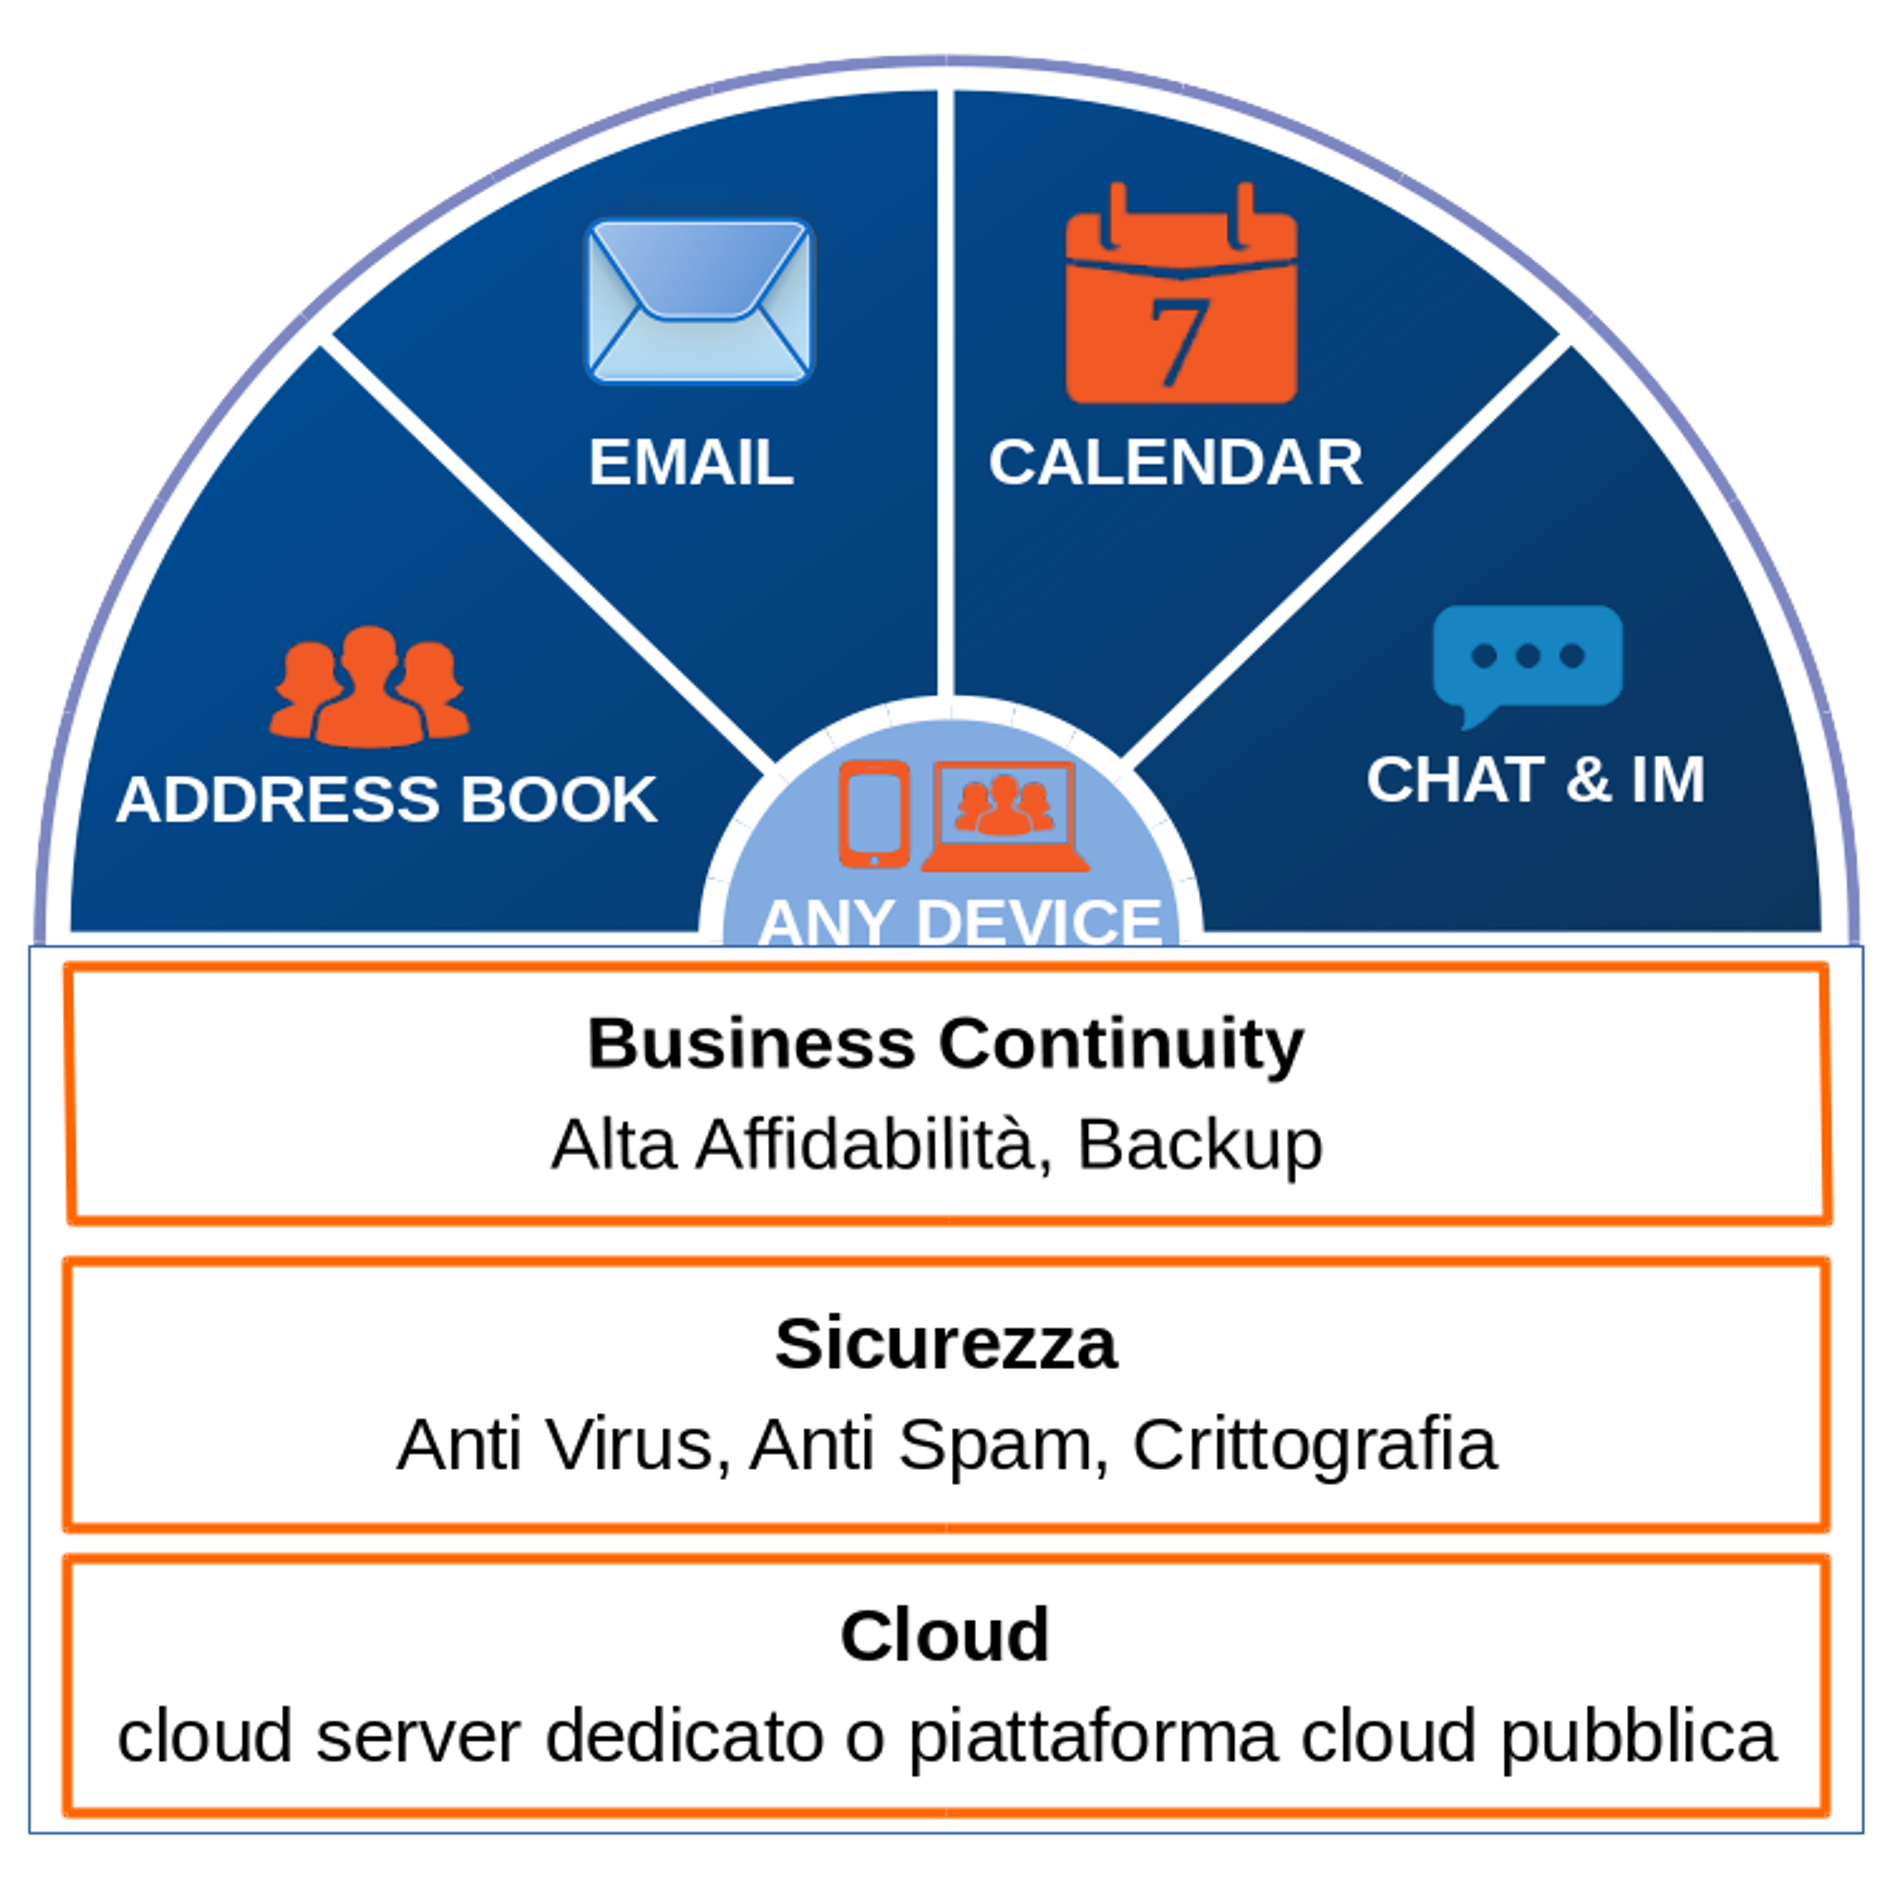 Zimbra email outsourcing spiegata attraverso uno schema intuitivo